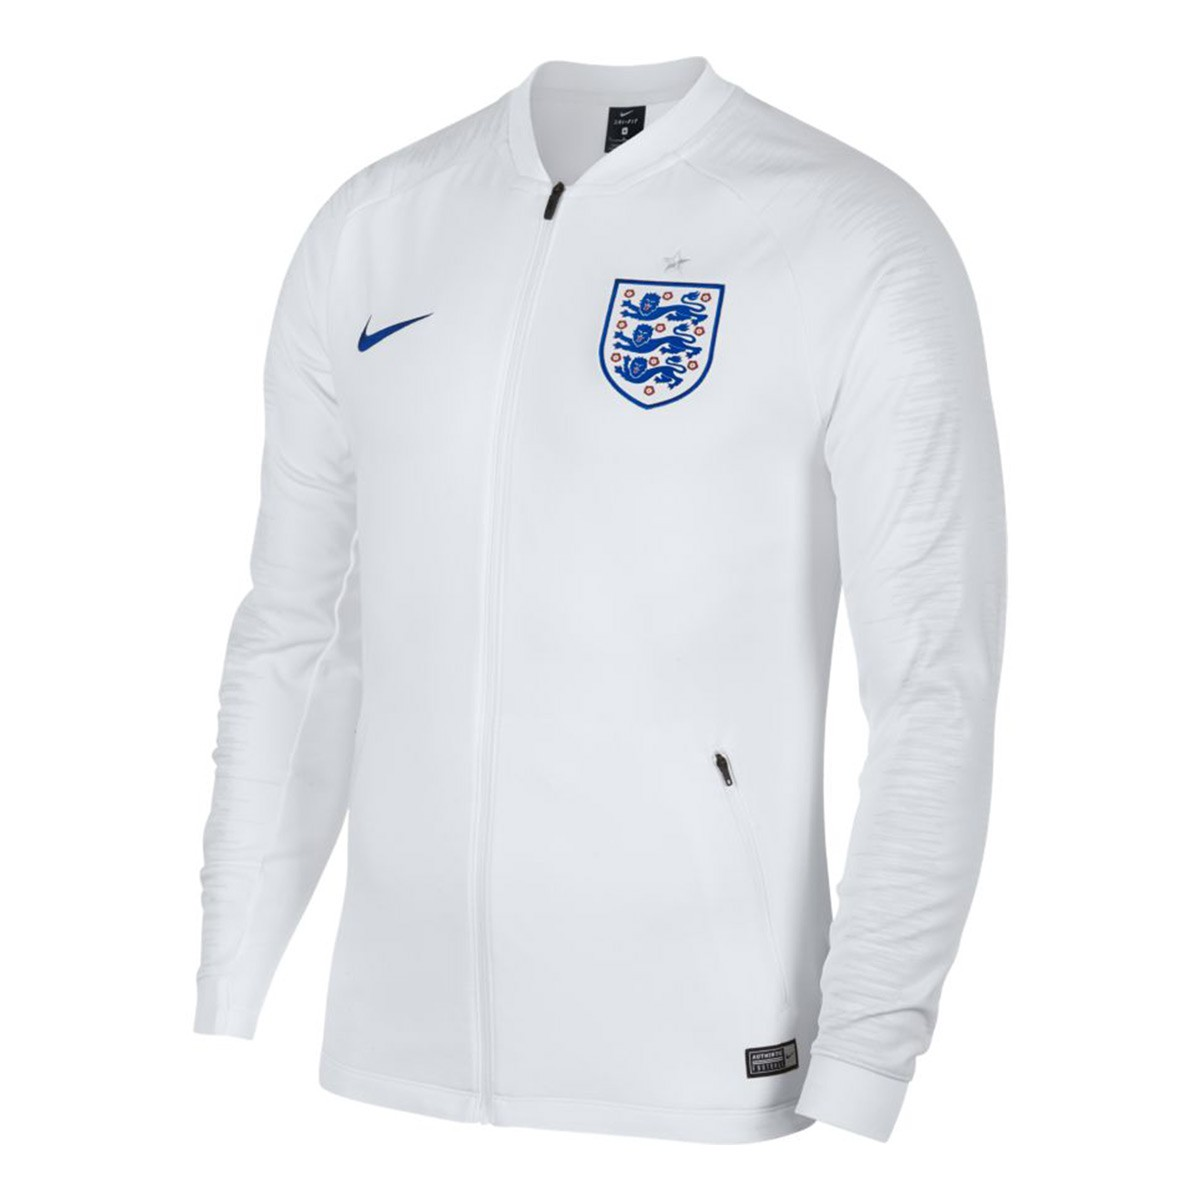 a6502121ce351 Chaqueta Nike Inglaterra Pre-Match 2018-2019 White-Off white-Sport royal -  Tienda de fútbol Fútbol Emotion